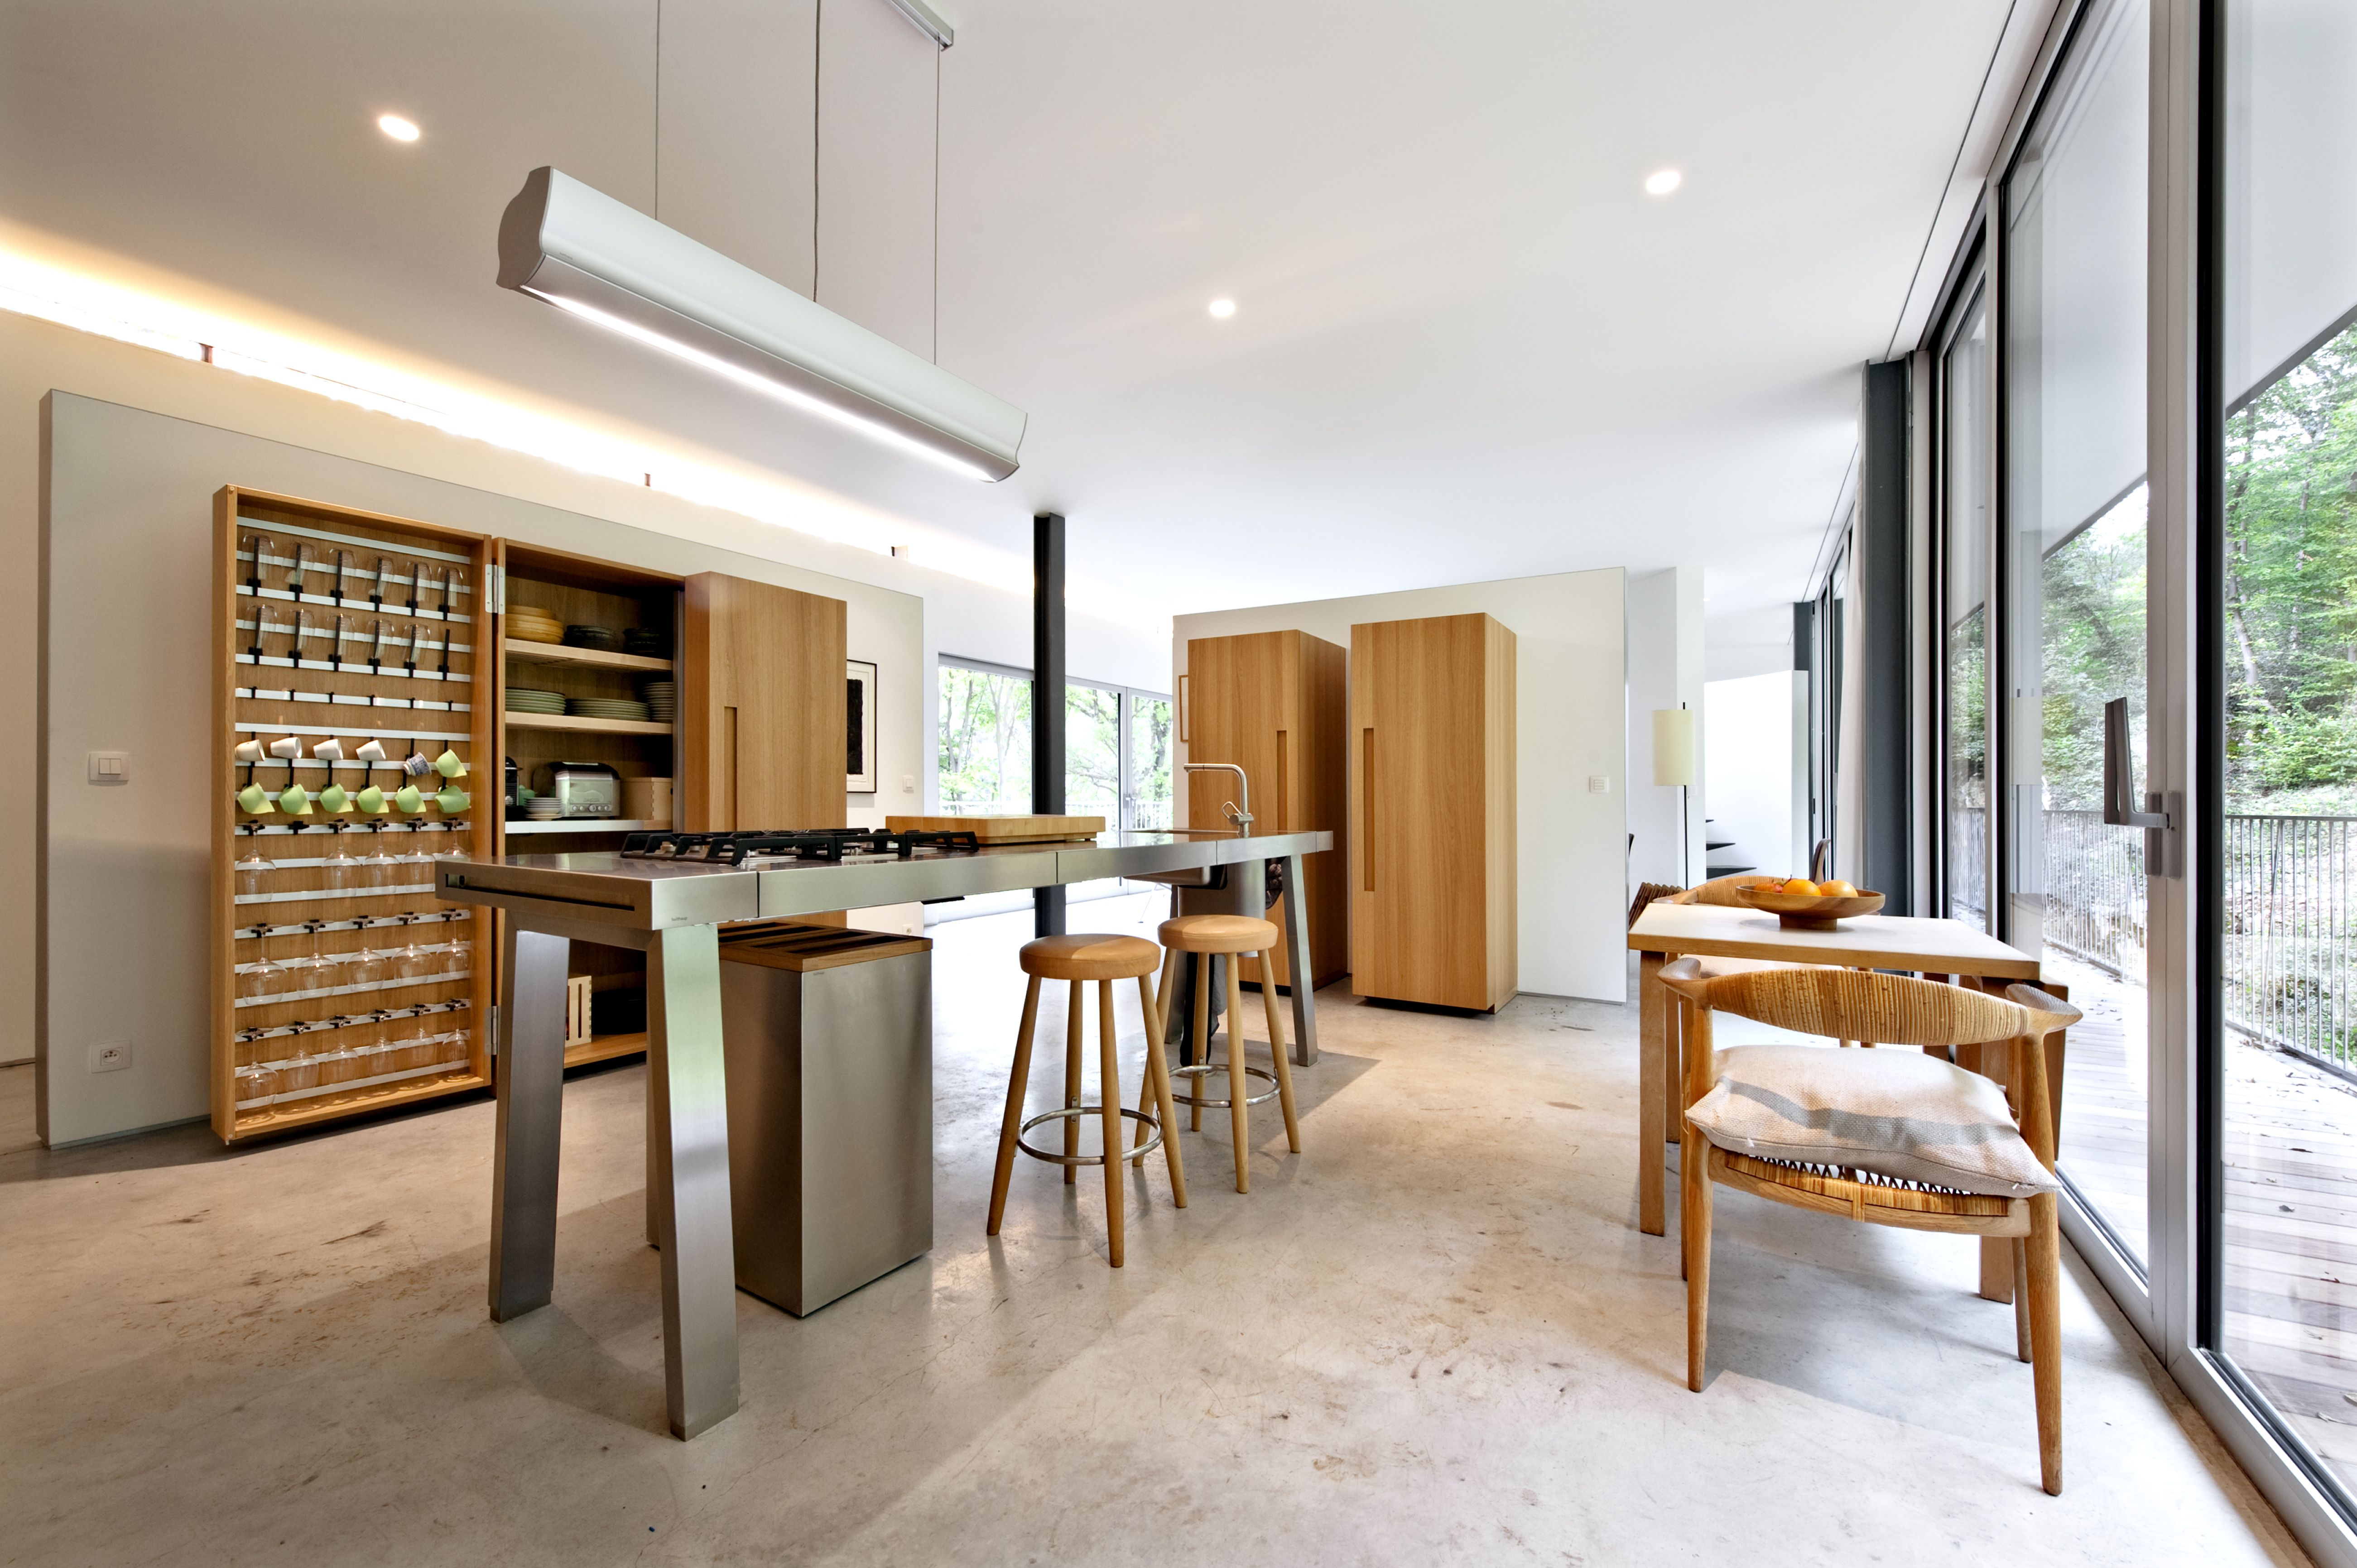 Cuisine b2 by the kitchen li ge kitchen pinterest kitchen cuisine and design for Bulthaup cuisine